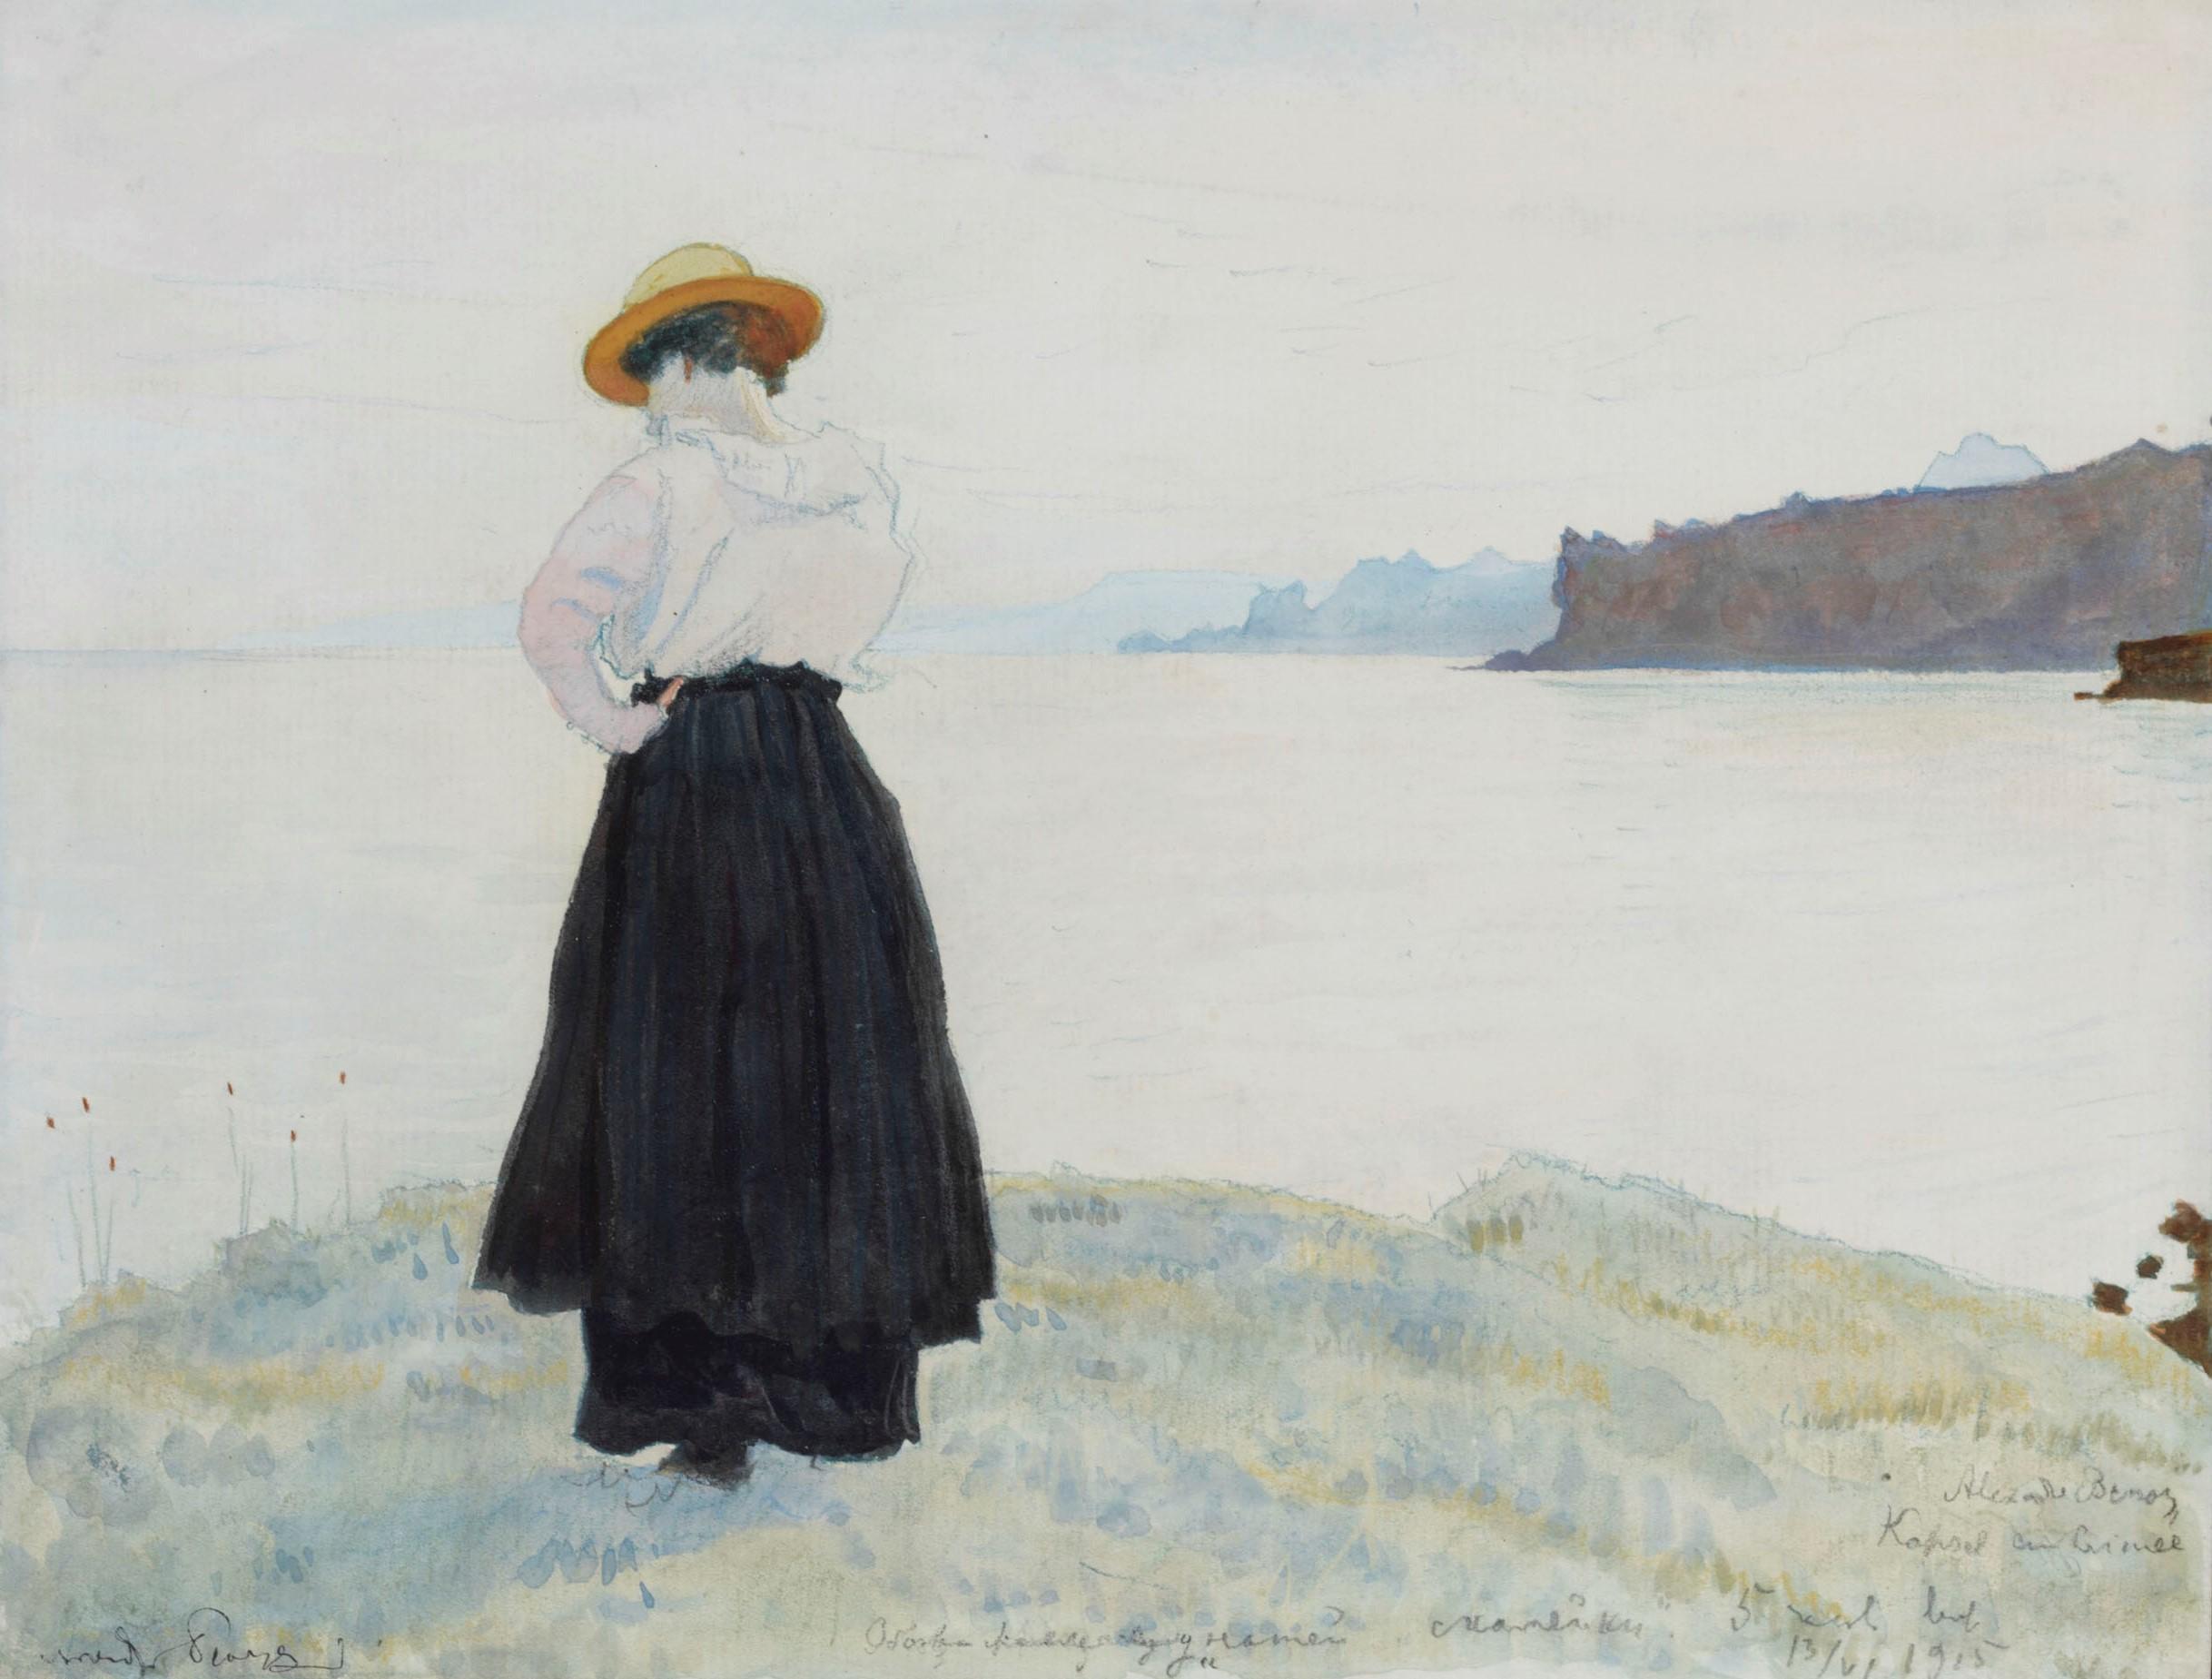 The Crimea. The Artist's wife, Anna on the sea shore, 1915 - Alexander Benois